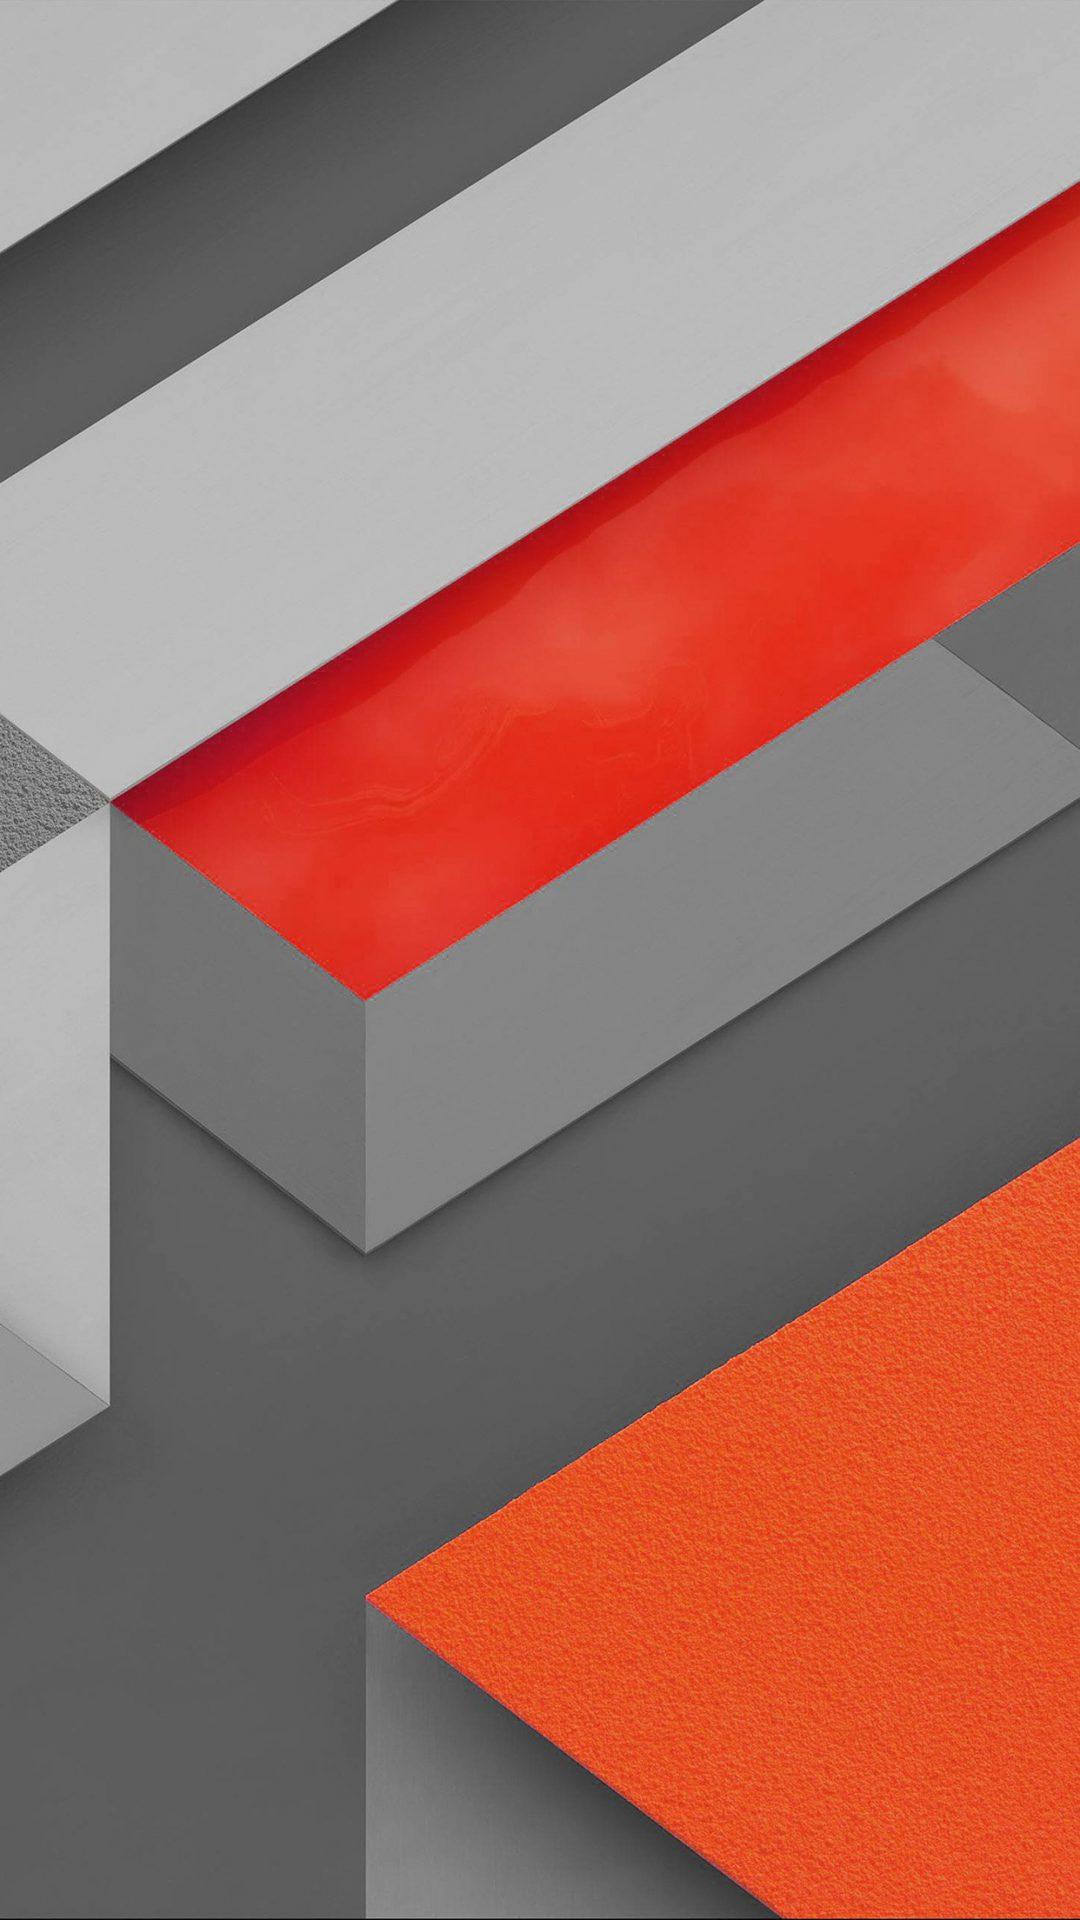 Marshmallow Android Orange Triangle Pattern